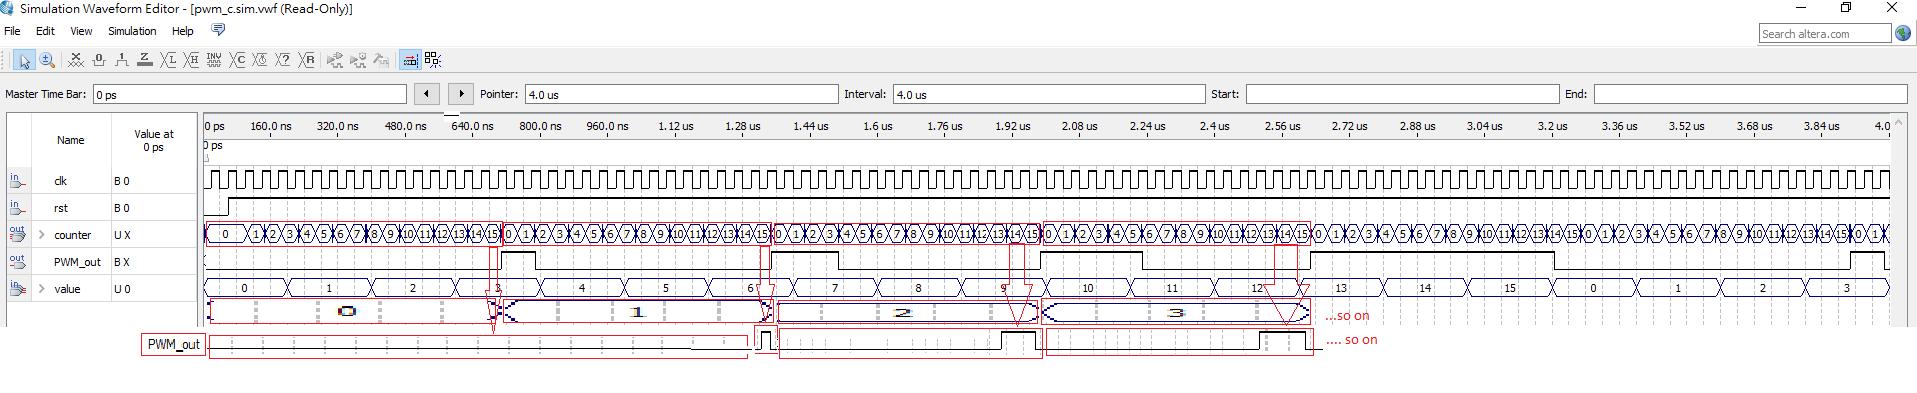 PWM with 4-bits control in Verilog - EmbDev net